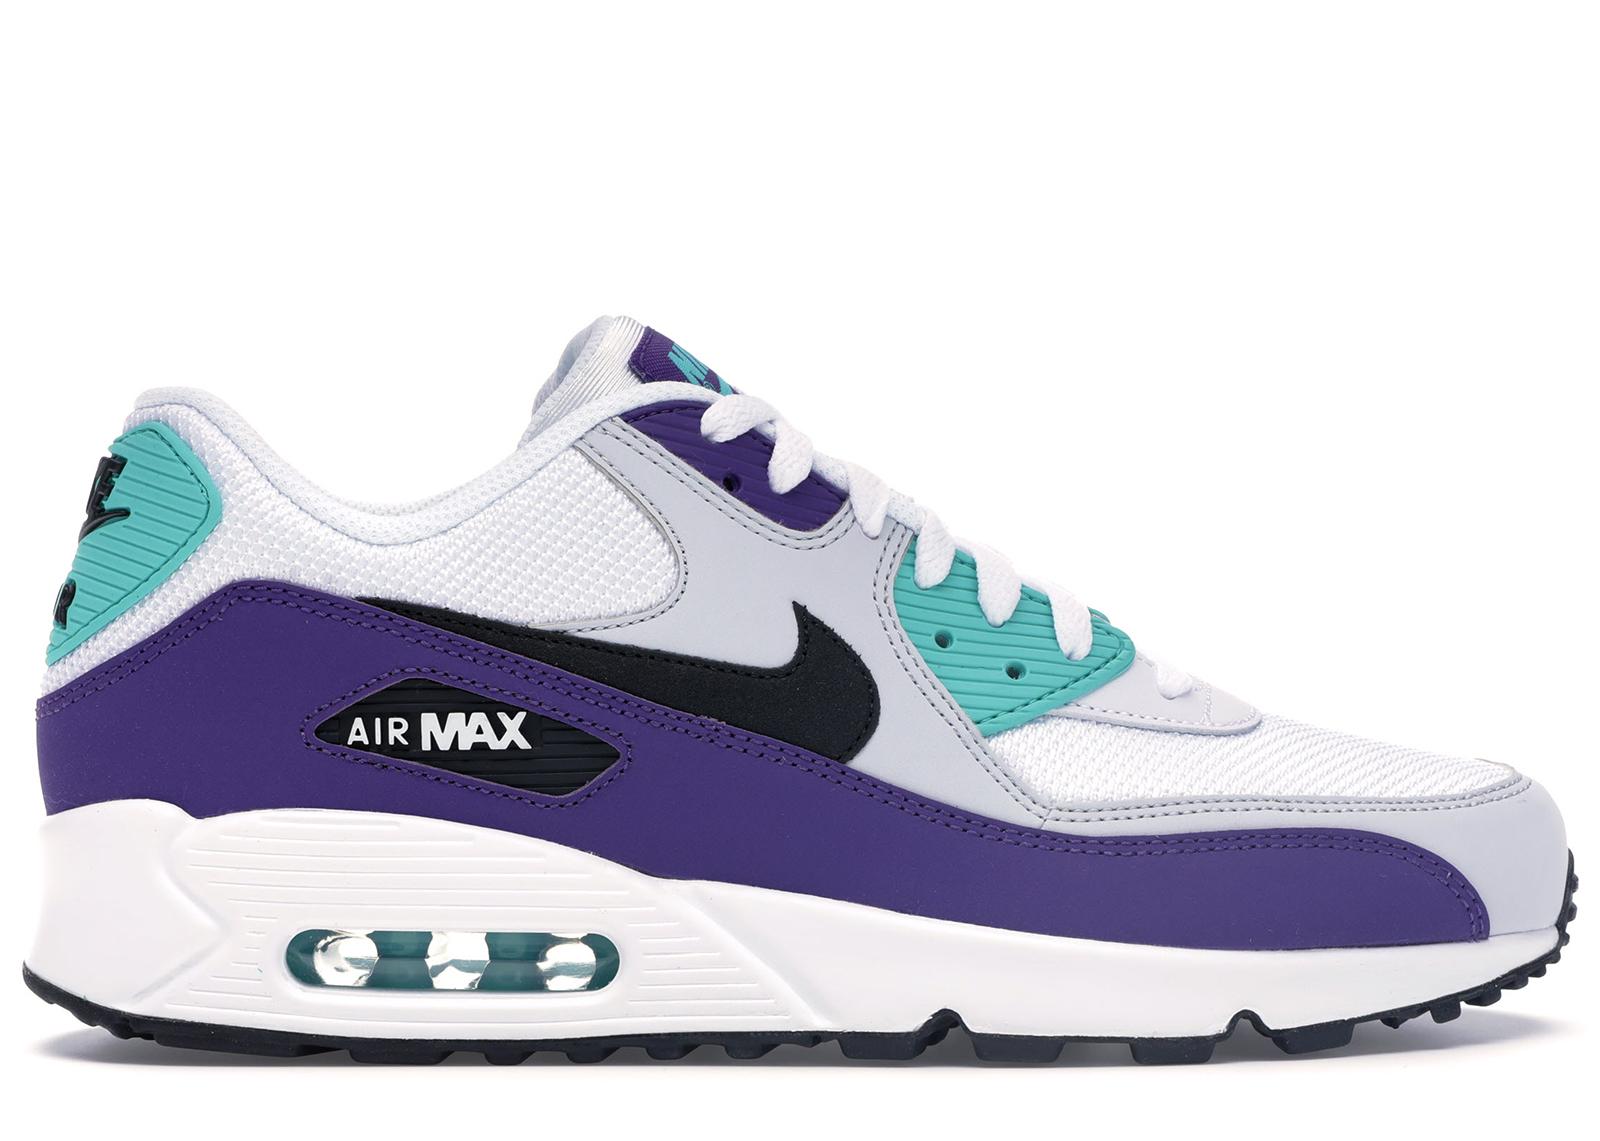 air max 90 uomo bianche viola